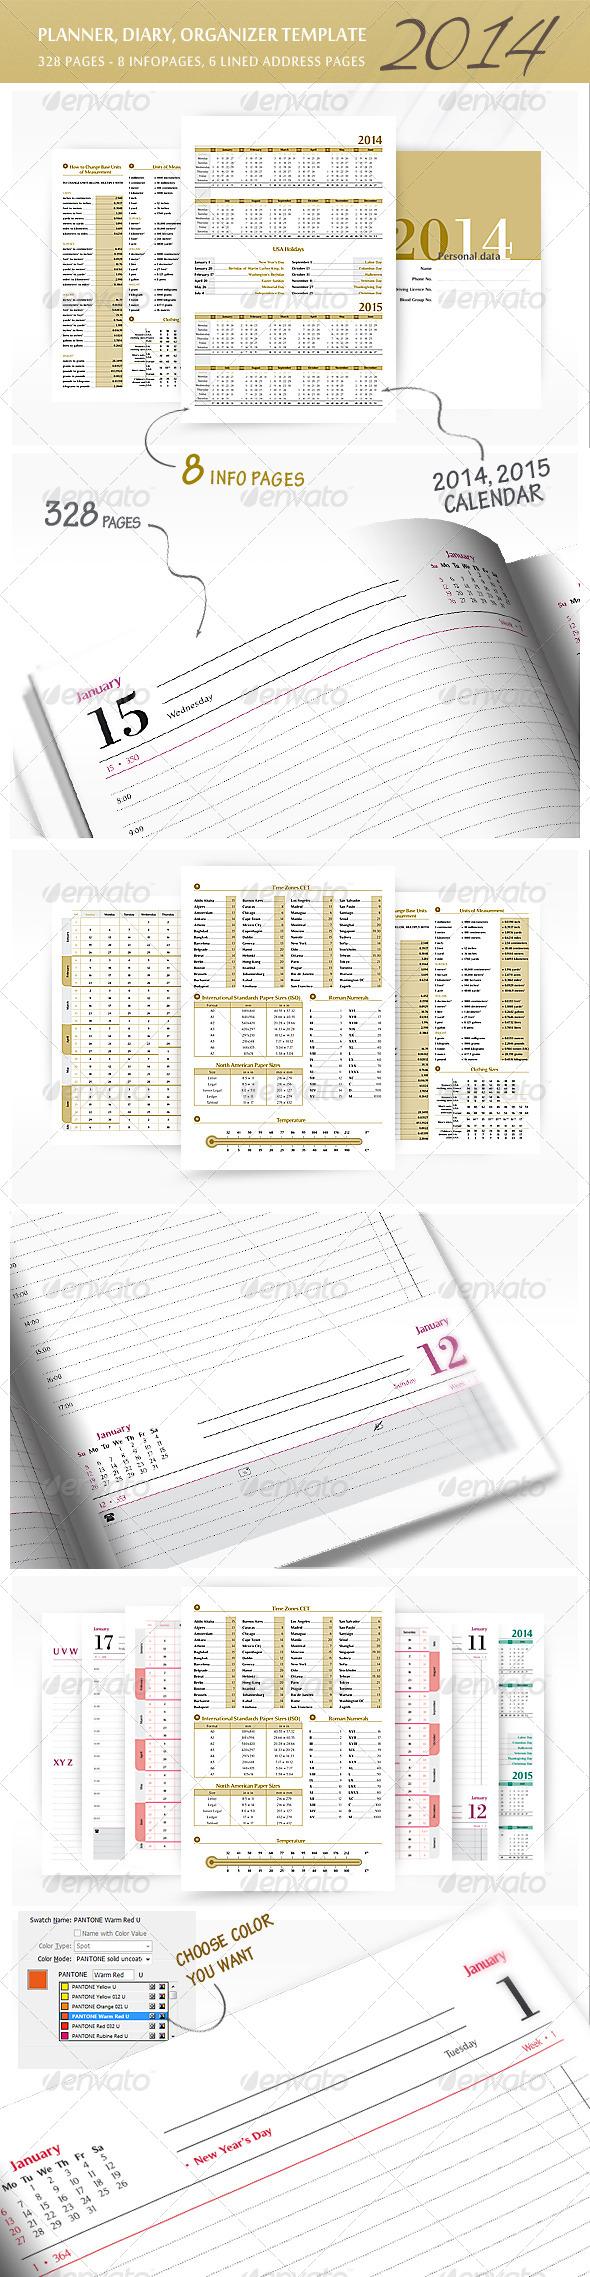 GraphicRiver Planner-Diary-Organizer 2014 v2 6138588